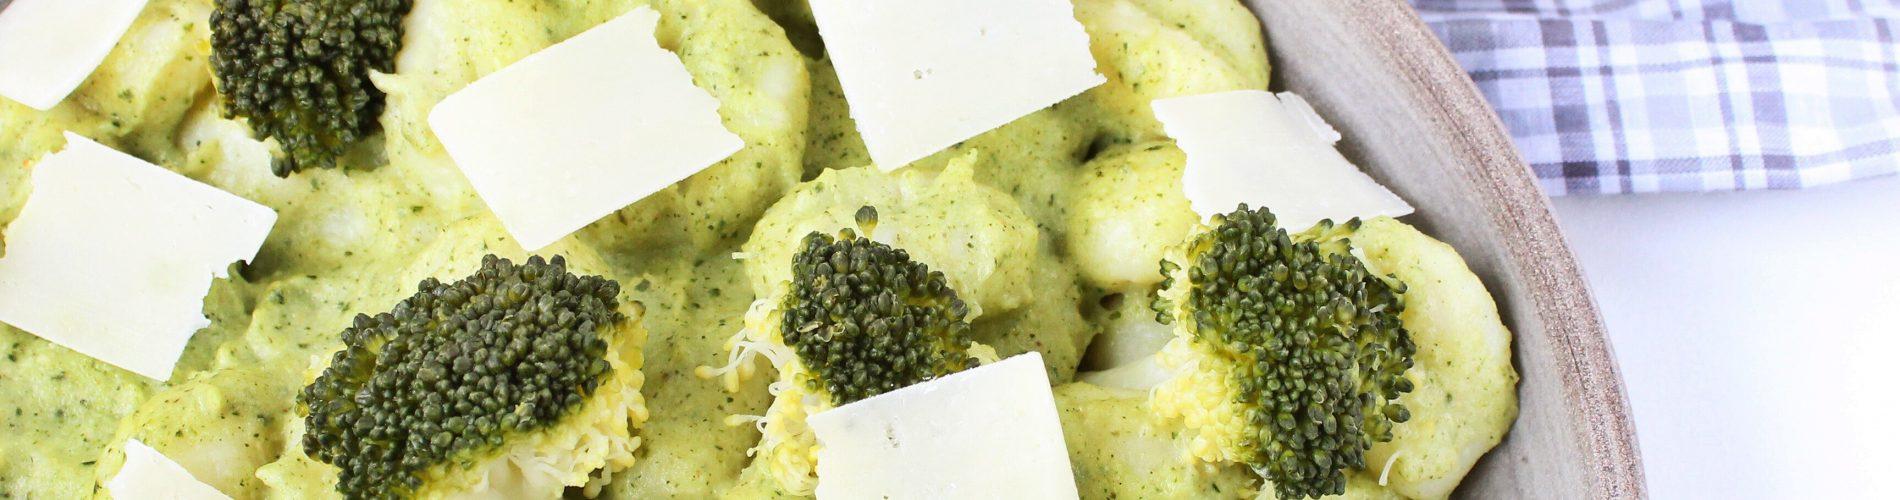 Avondeten | gnocchi met broccolipesto